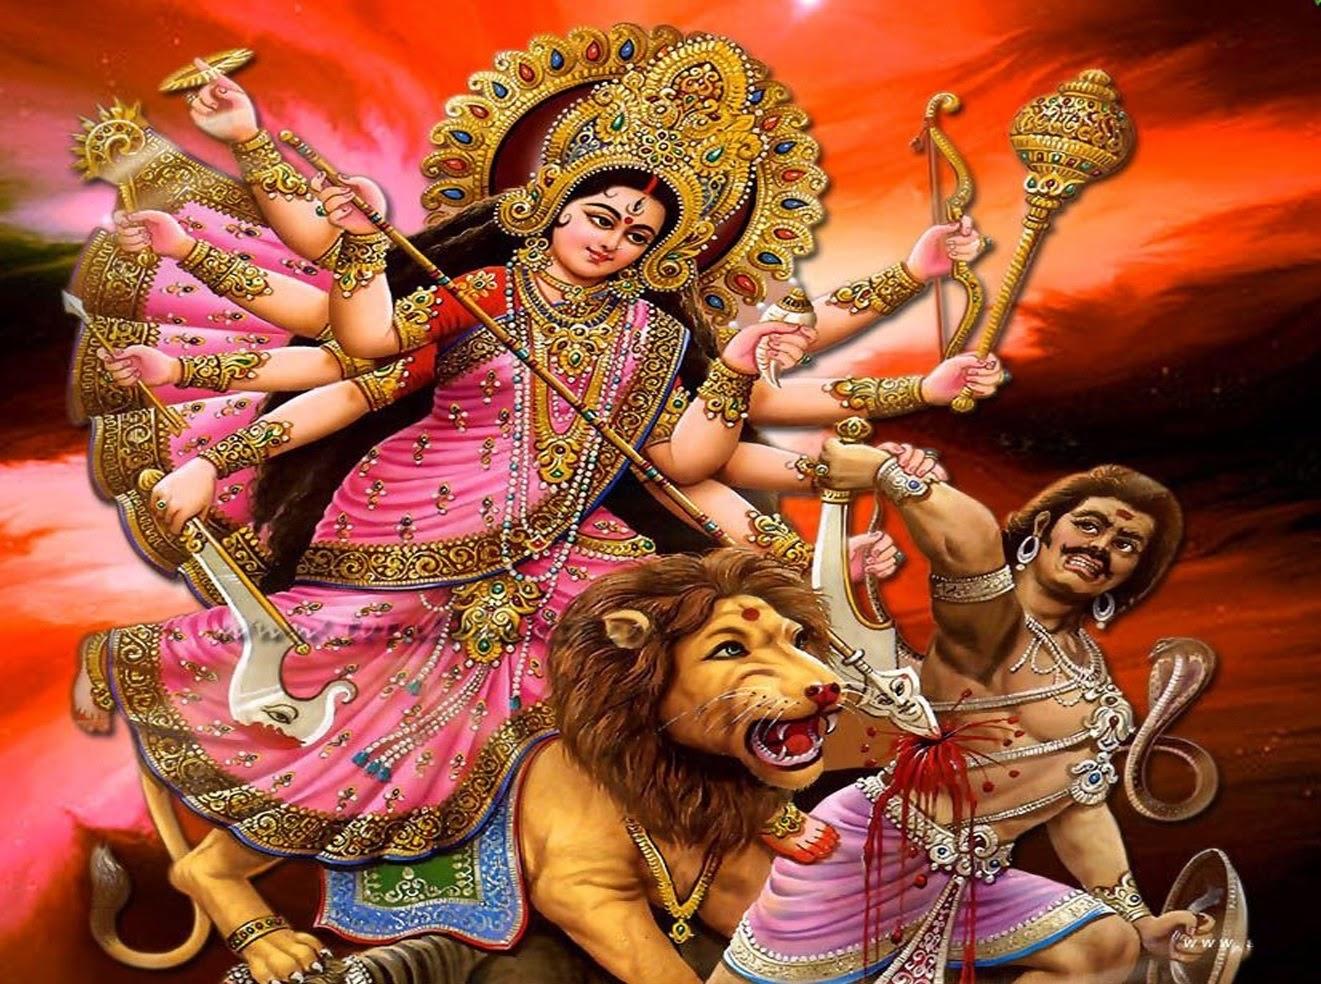 देवी दुर्गा के नौ रूप की सम्पूर्ण कहानी,Devi Durga Stories Navratri History In Hindi,maa Durga ki kahaniya,nayichetana.com,navratri special in hindi,durgama